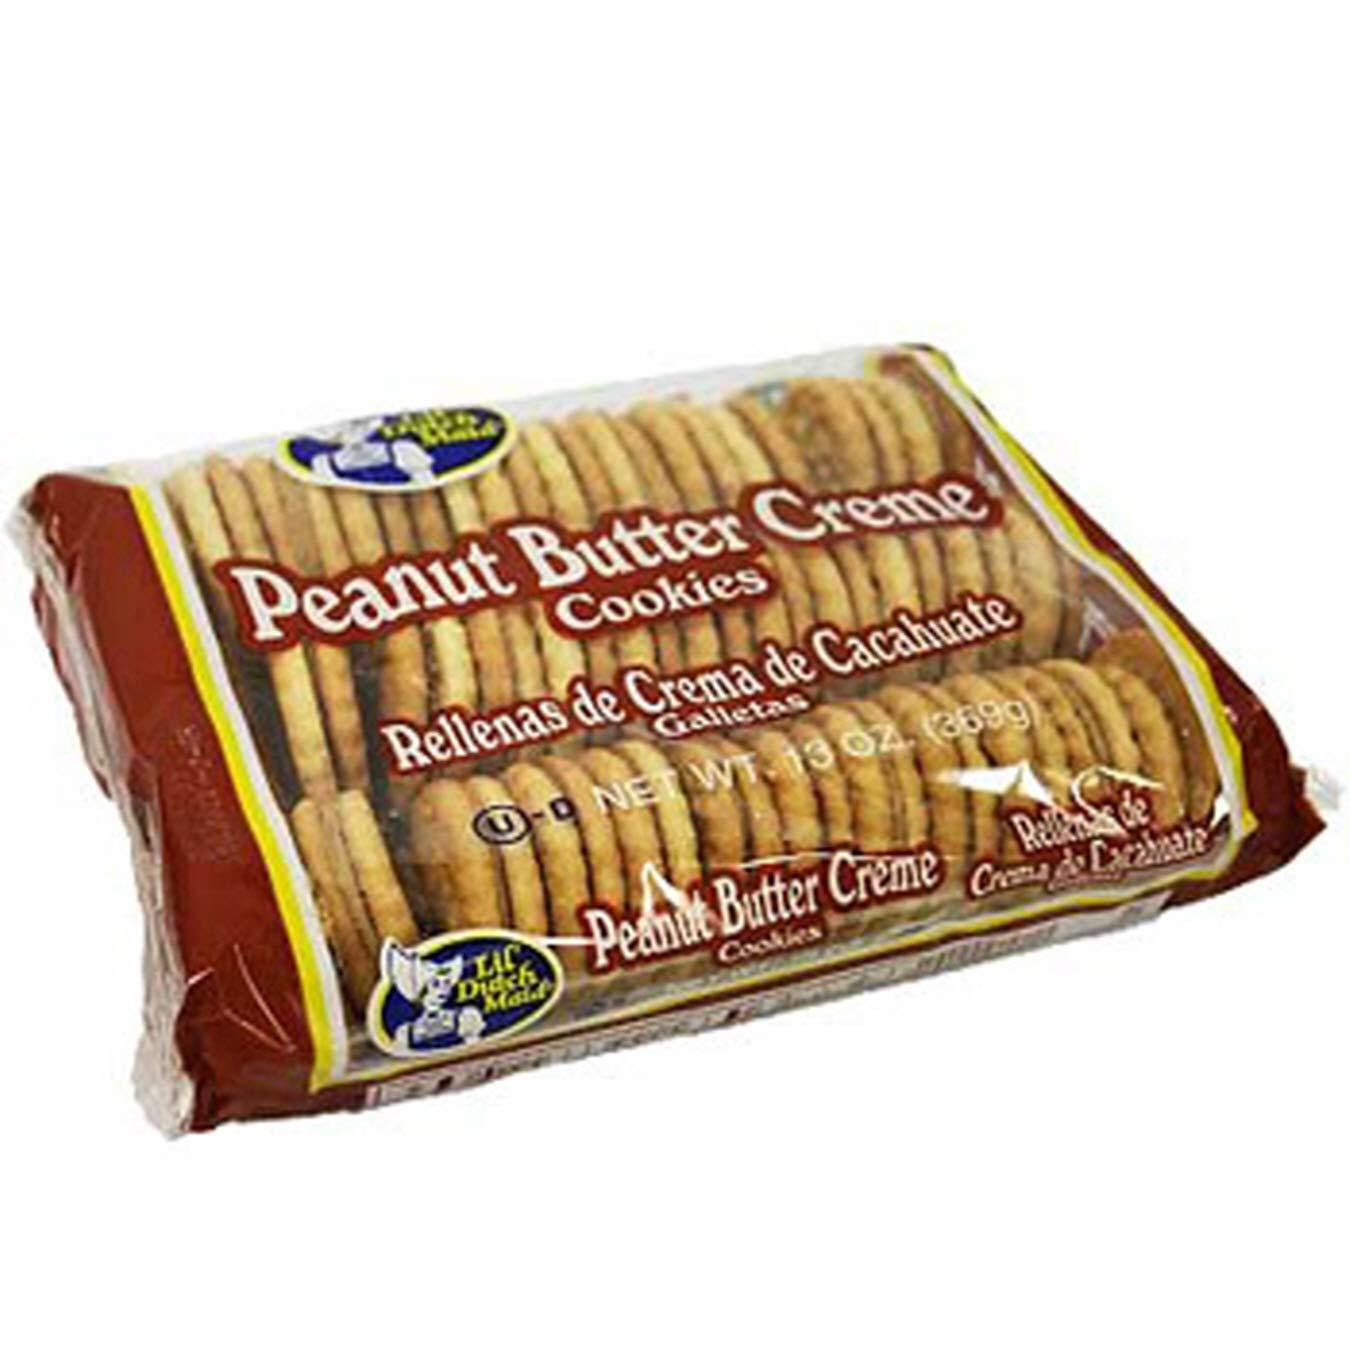 (Pack of 12) Lil Dutch Maid Crème Cookies Peanut Butter, Sandwich Cookies, 13oz